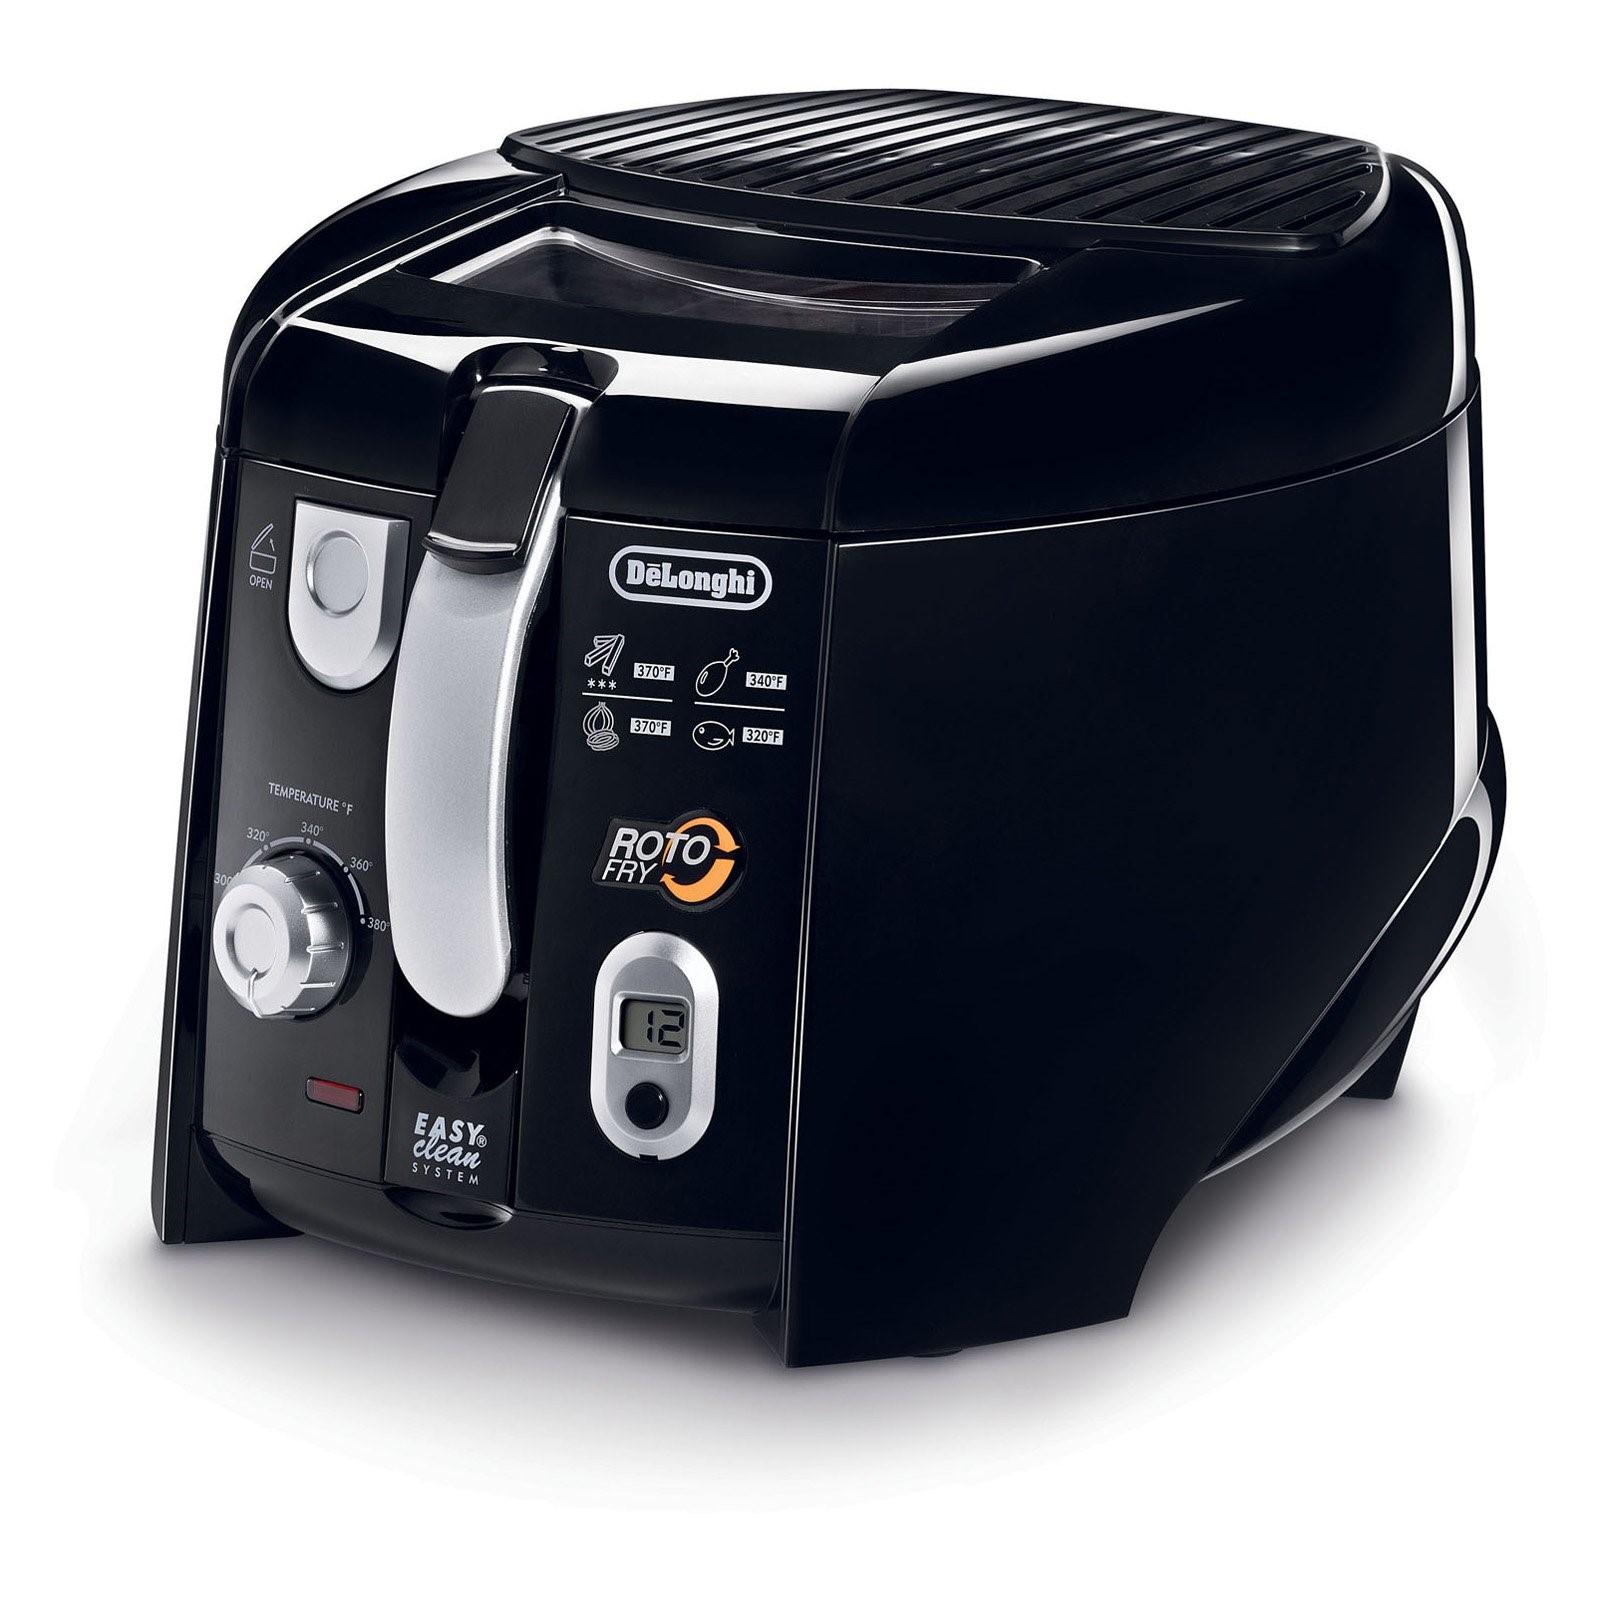 DeLonghi D28313UXBK Cool Touch Roto Deep Fryer